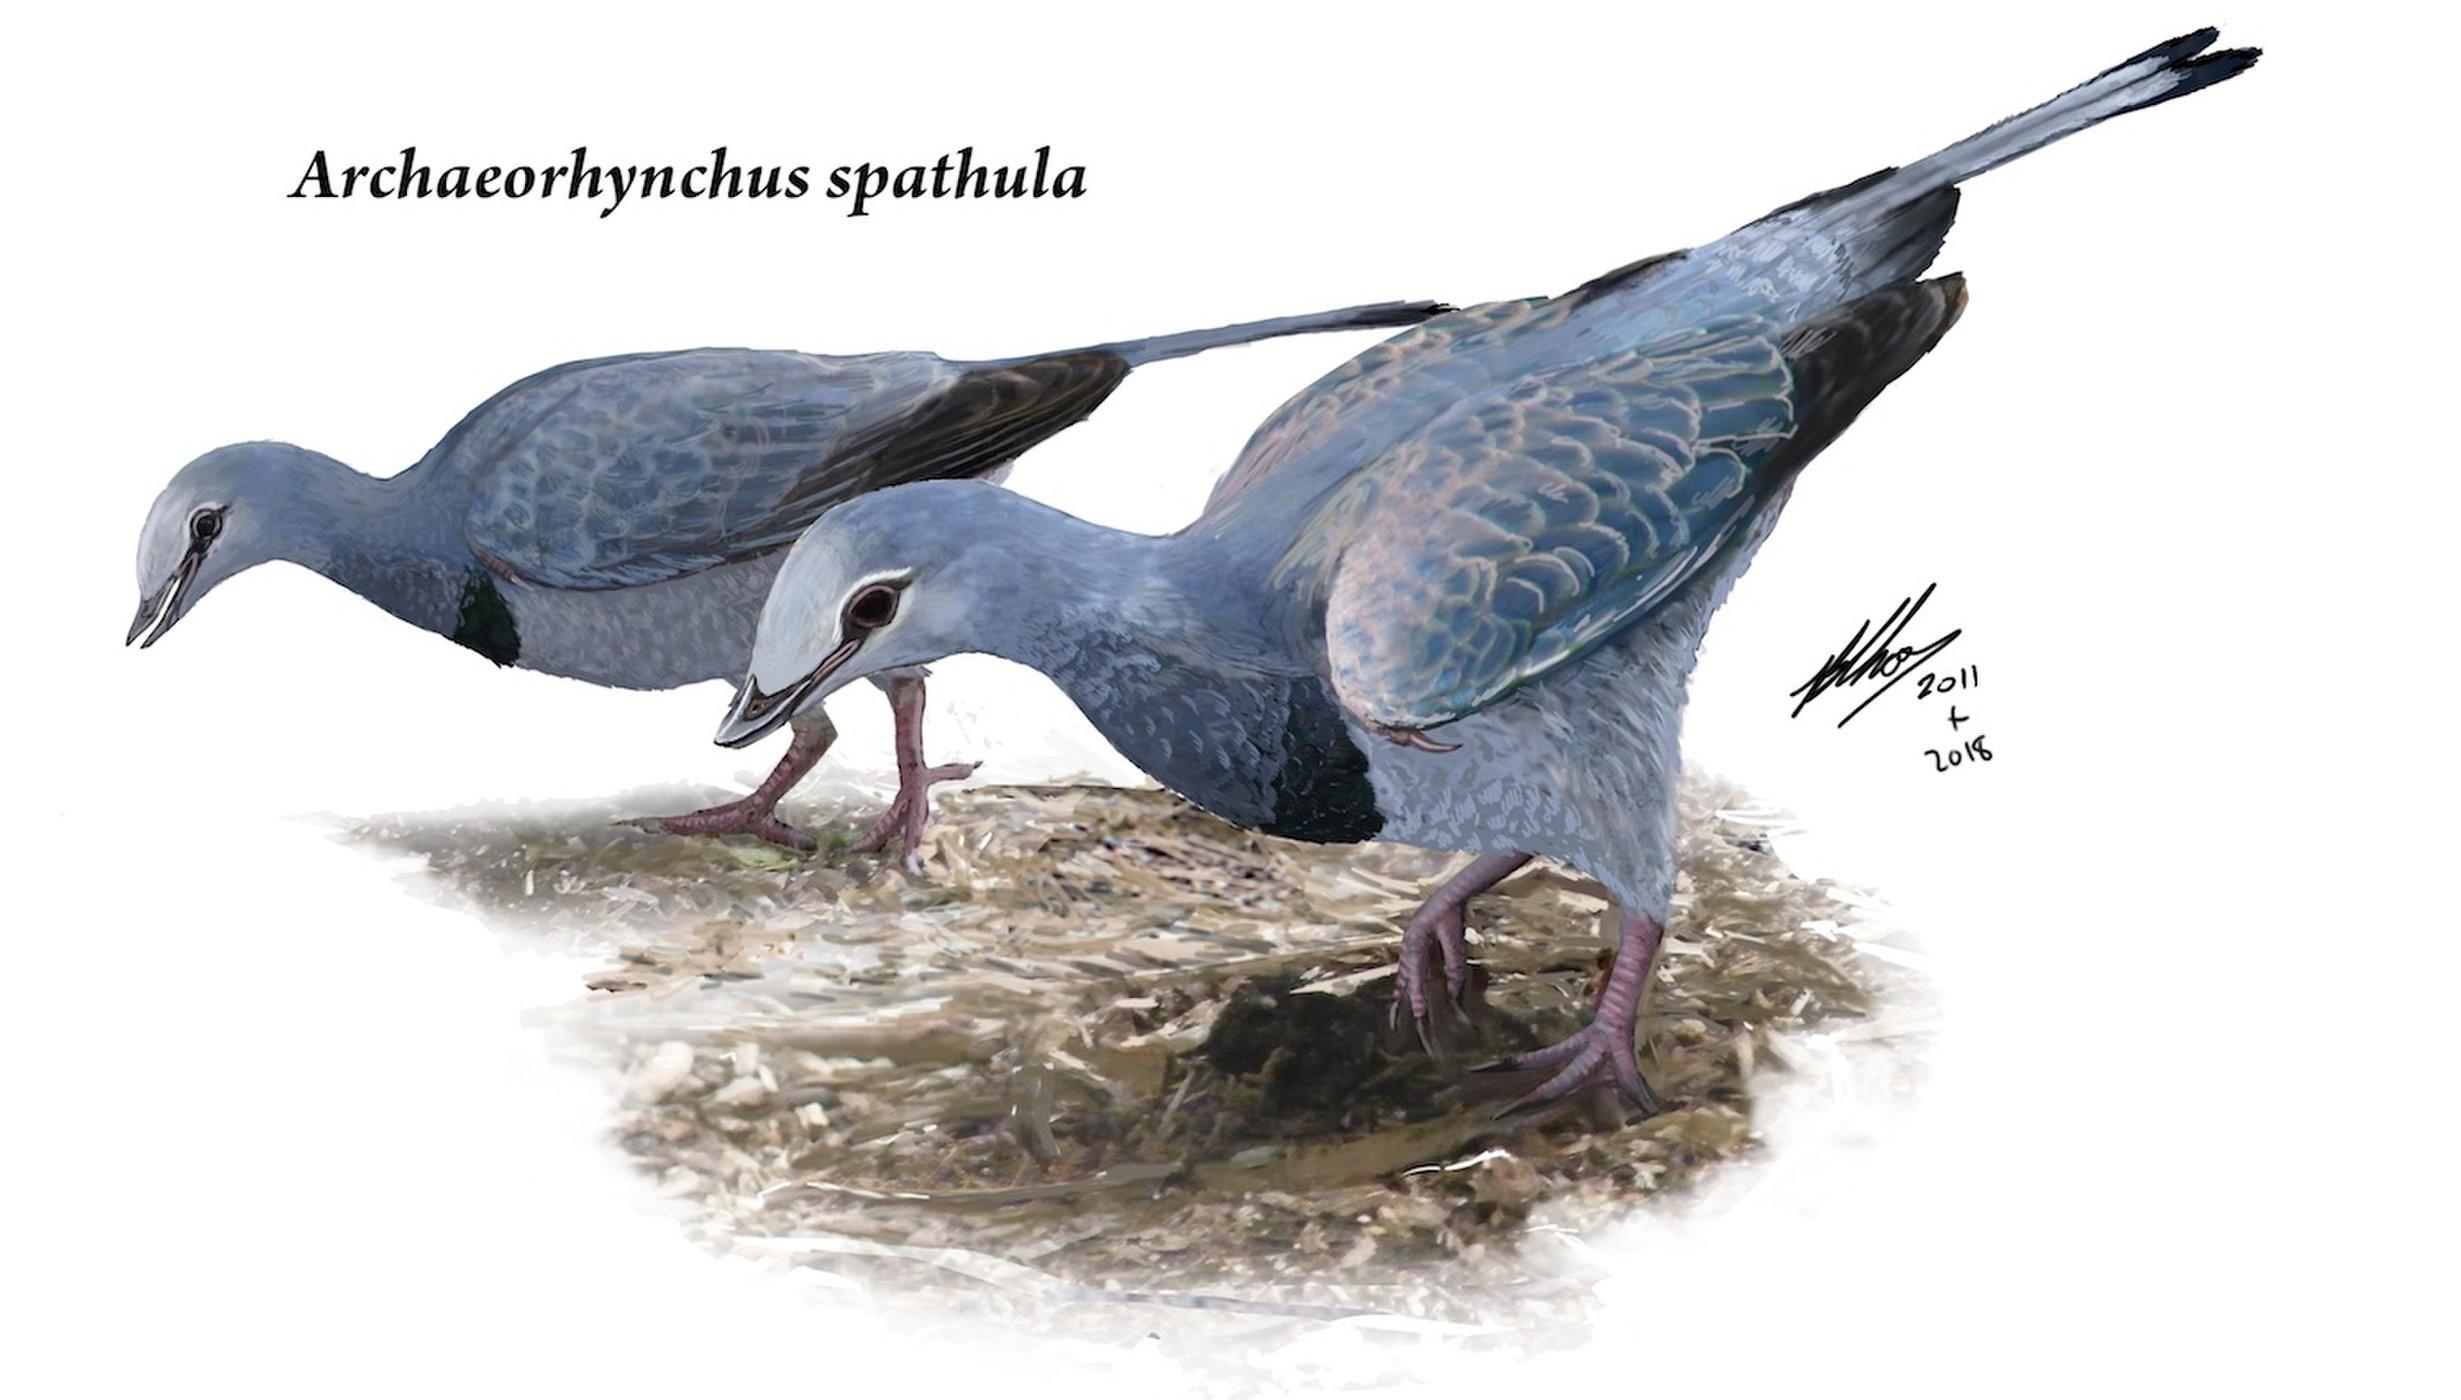 Archaeorhynchus spathula (Foto: Brian Choo)